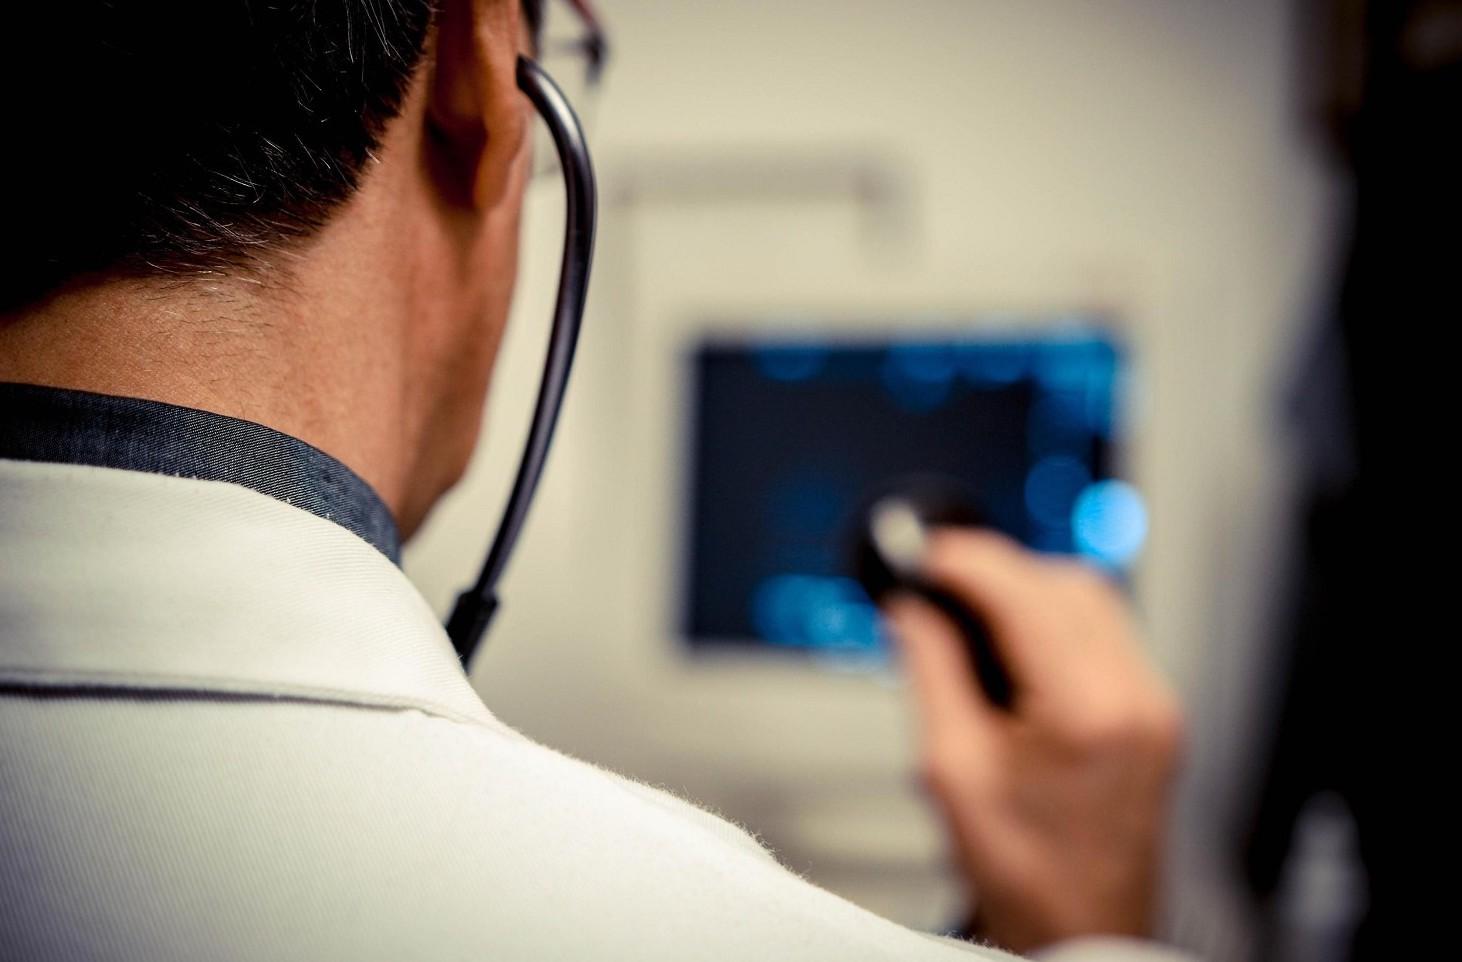 Visite fiscali malattia, casi particolar